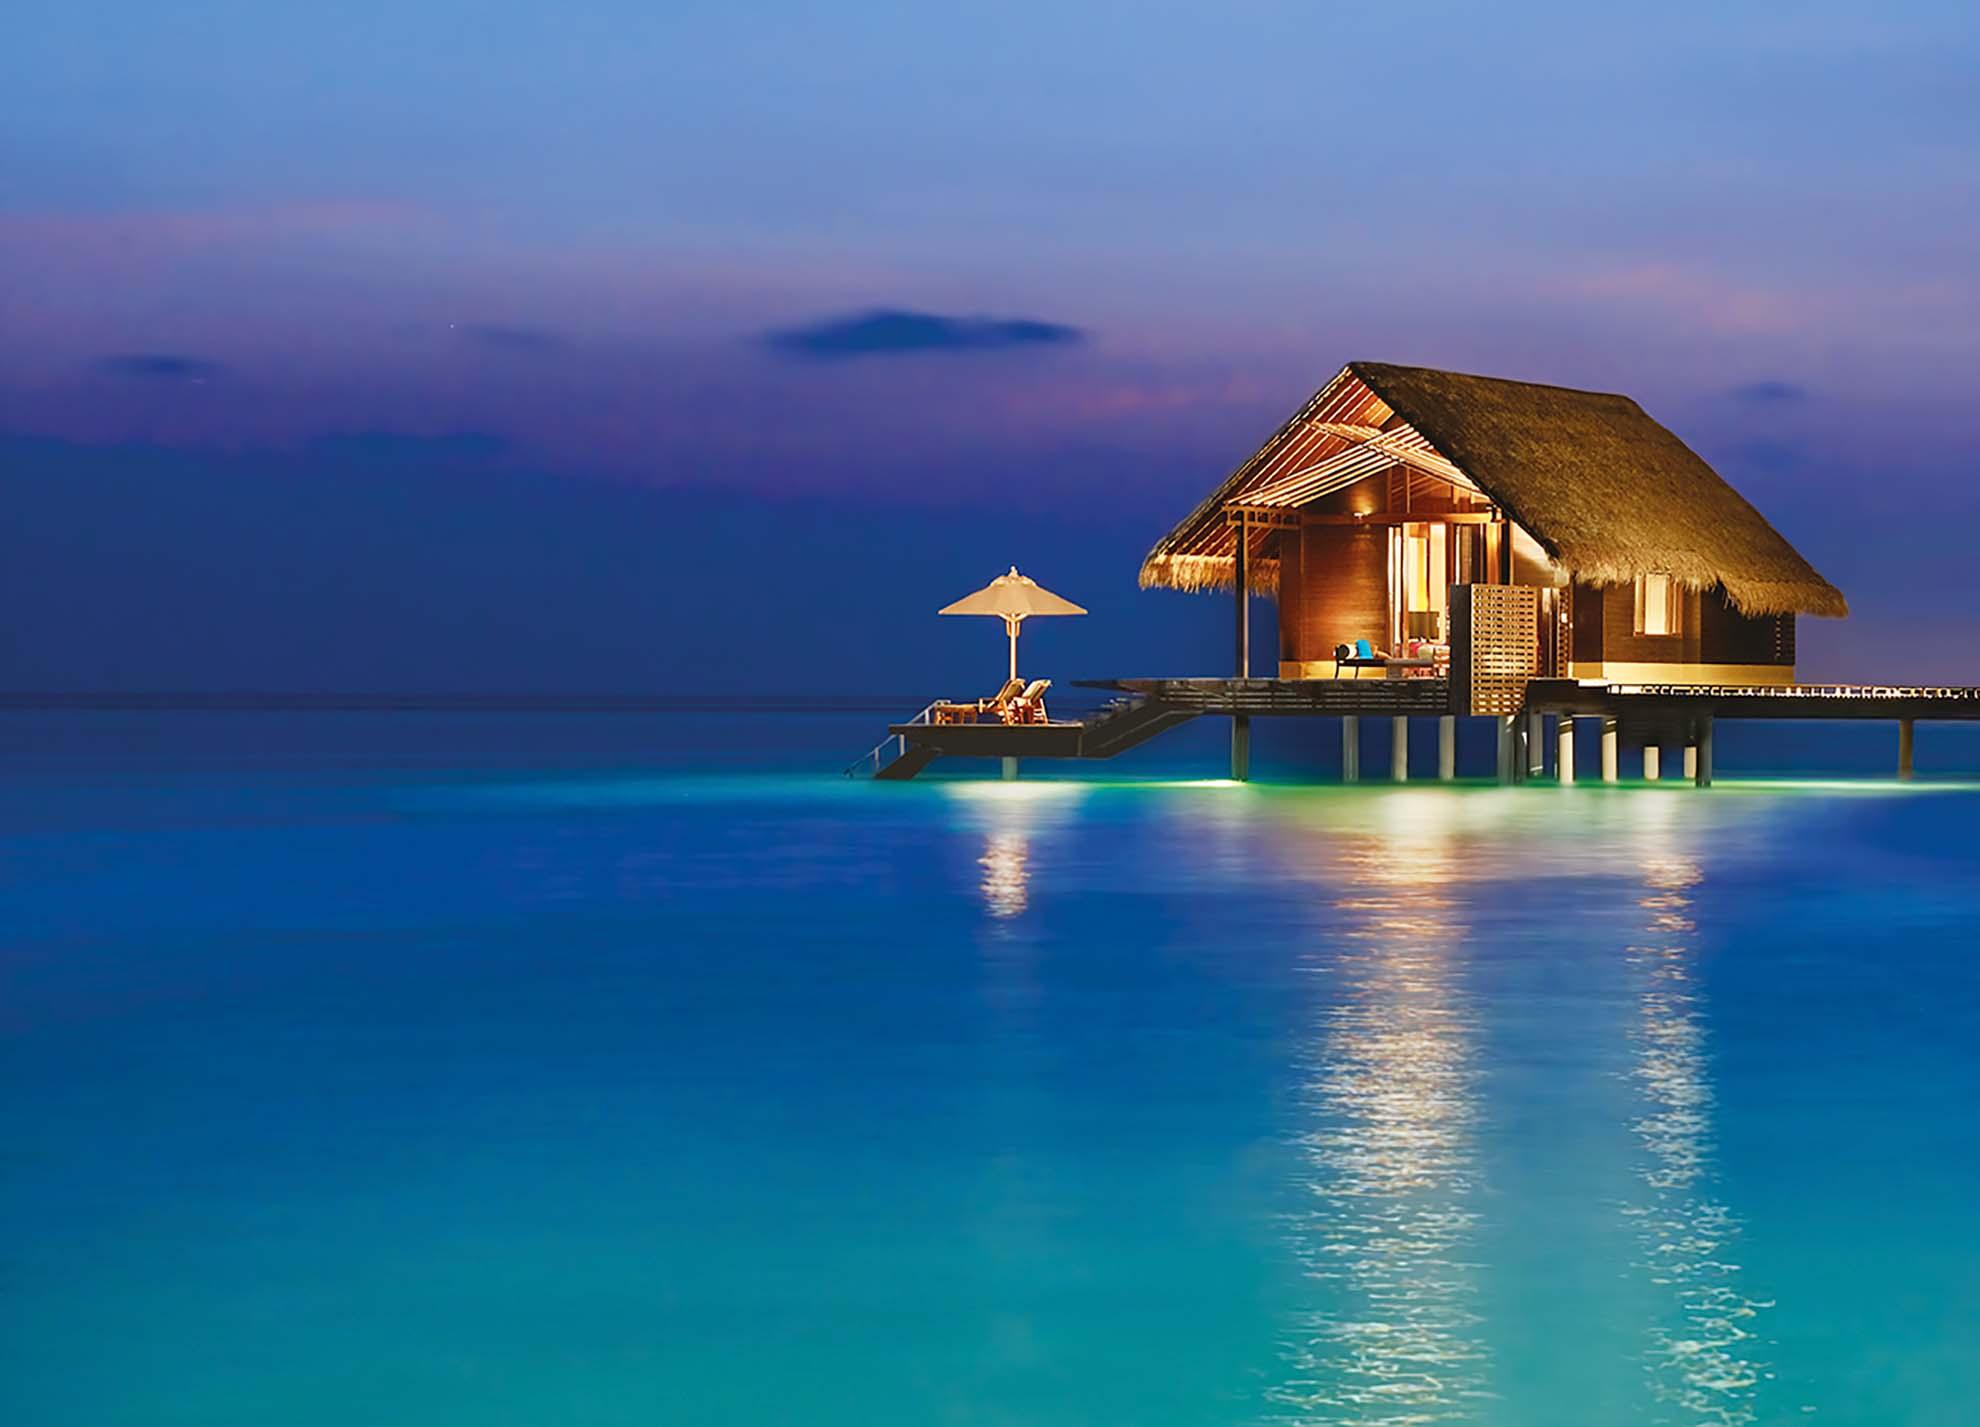 reethi_rah_maldives_accommodation_29_01_2016_238hr